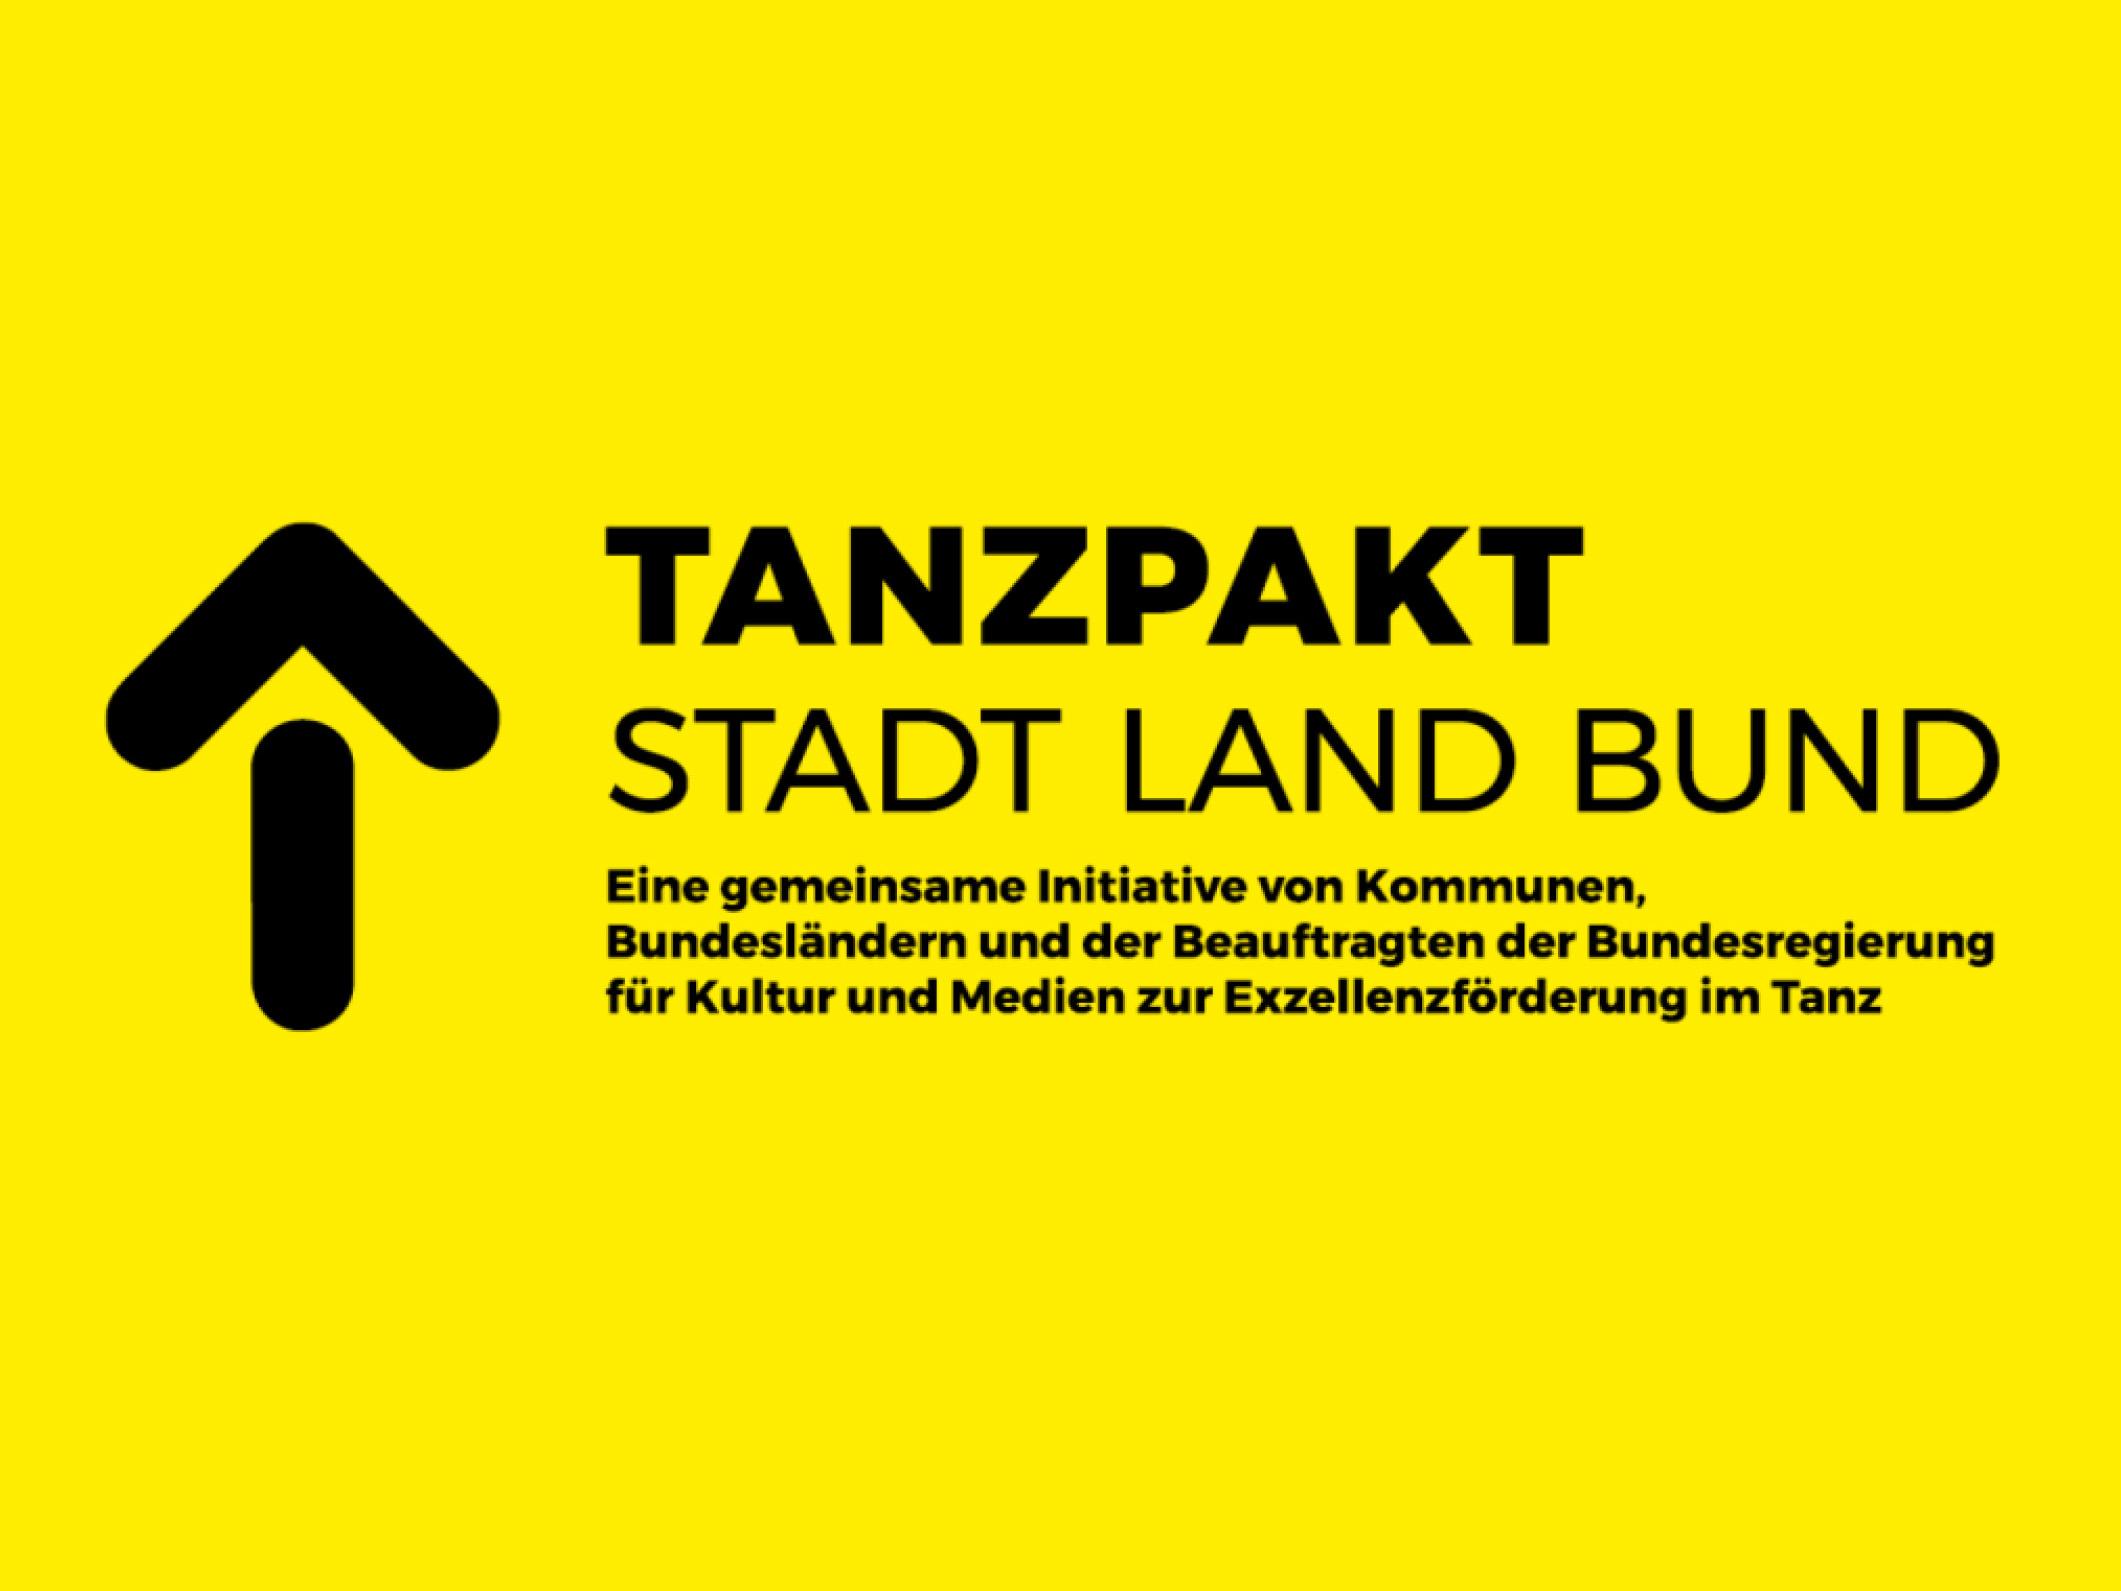 TANZPAKT-LOGO-Website.jpg